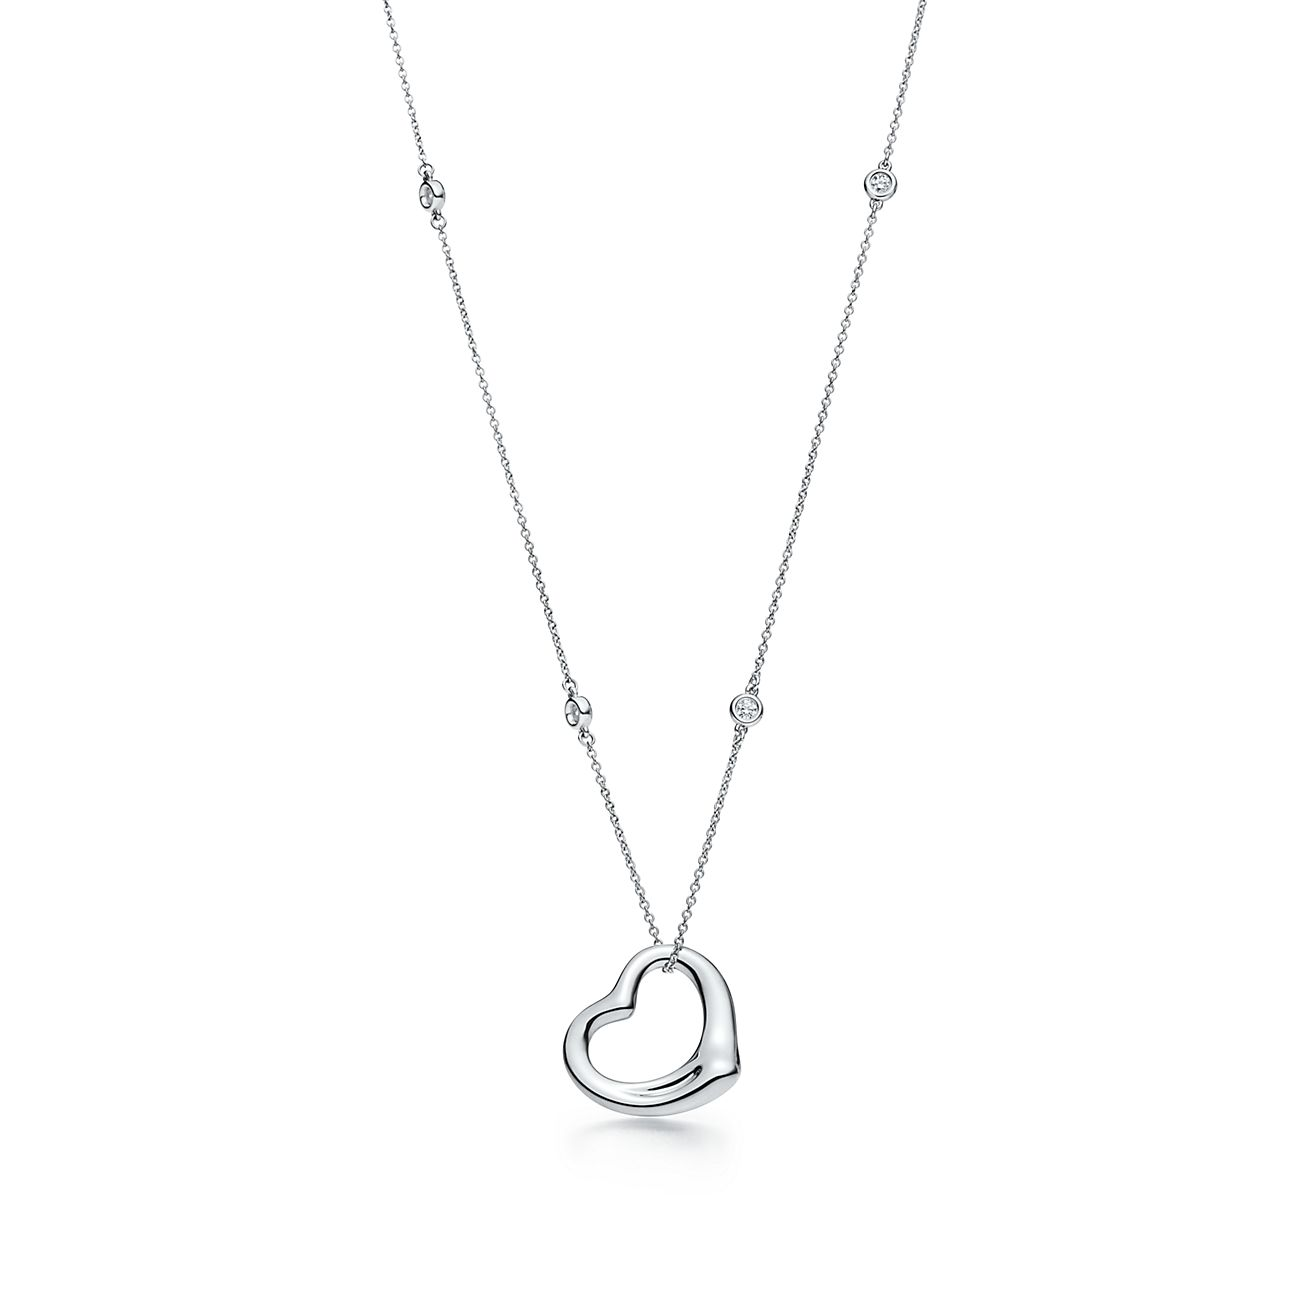 Elsa Peretti Diamonds by the Yard Open Heart pendant in sterling silver Tiffany & Co.